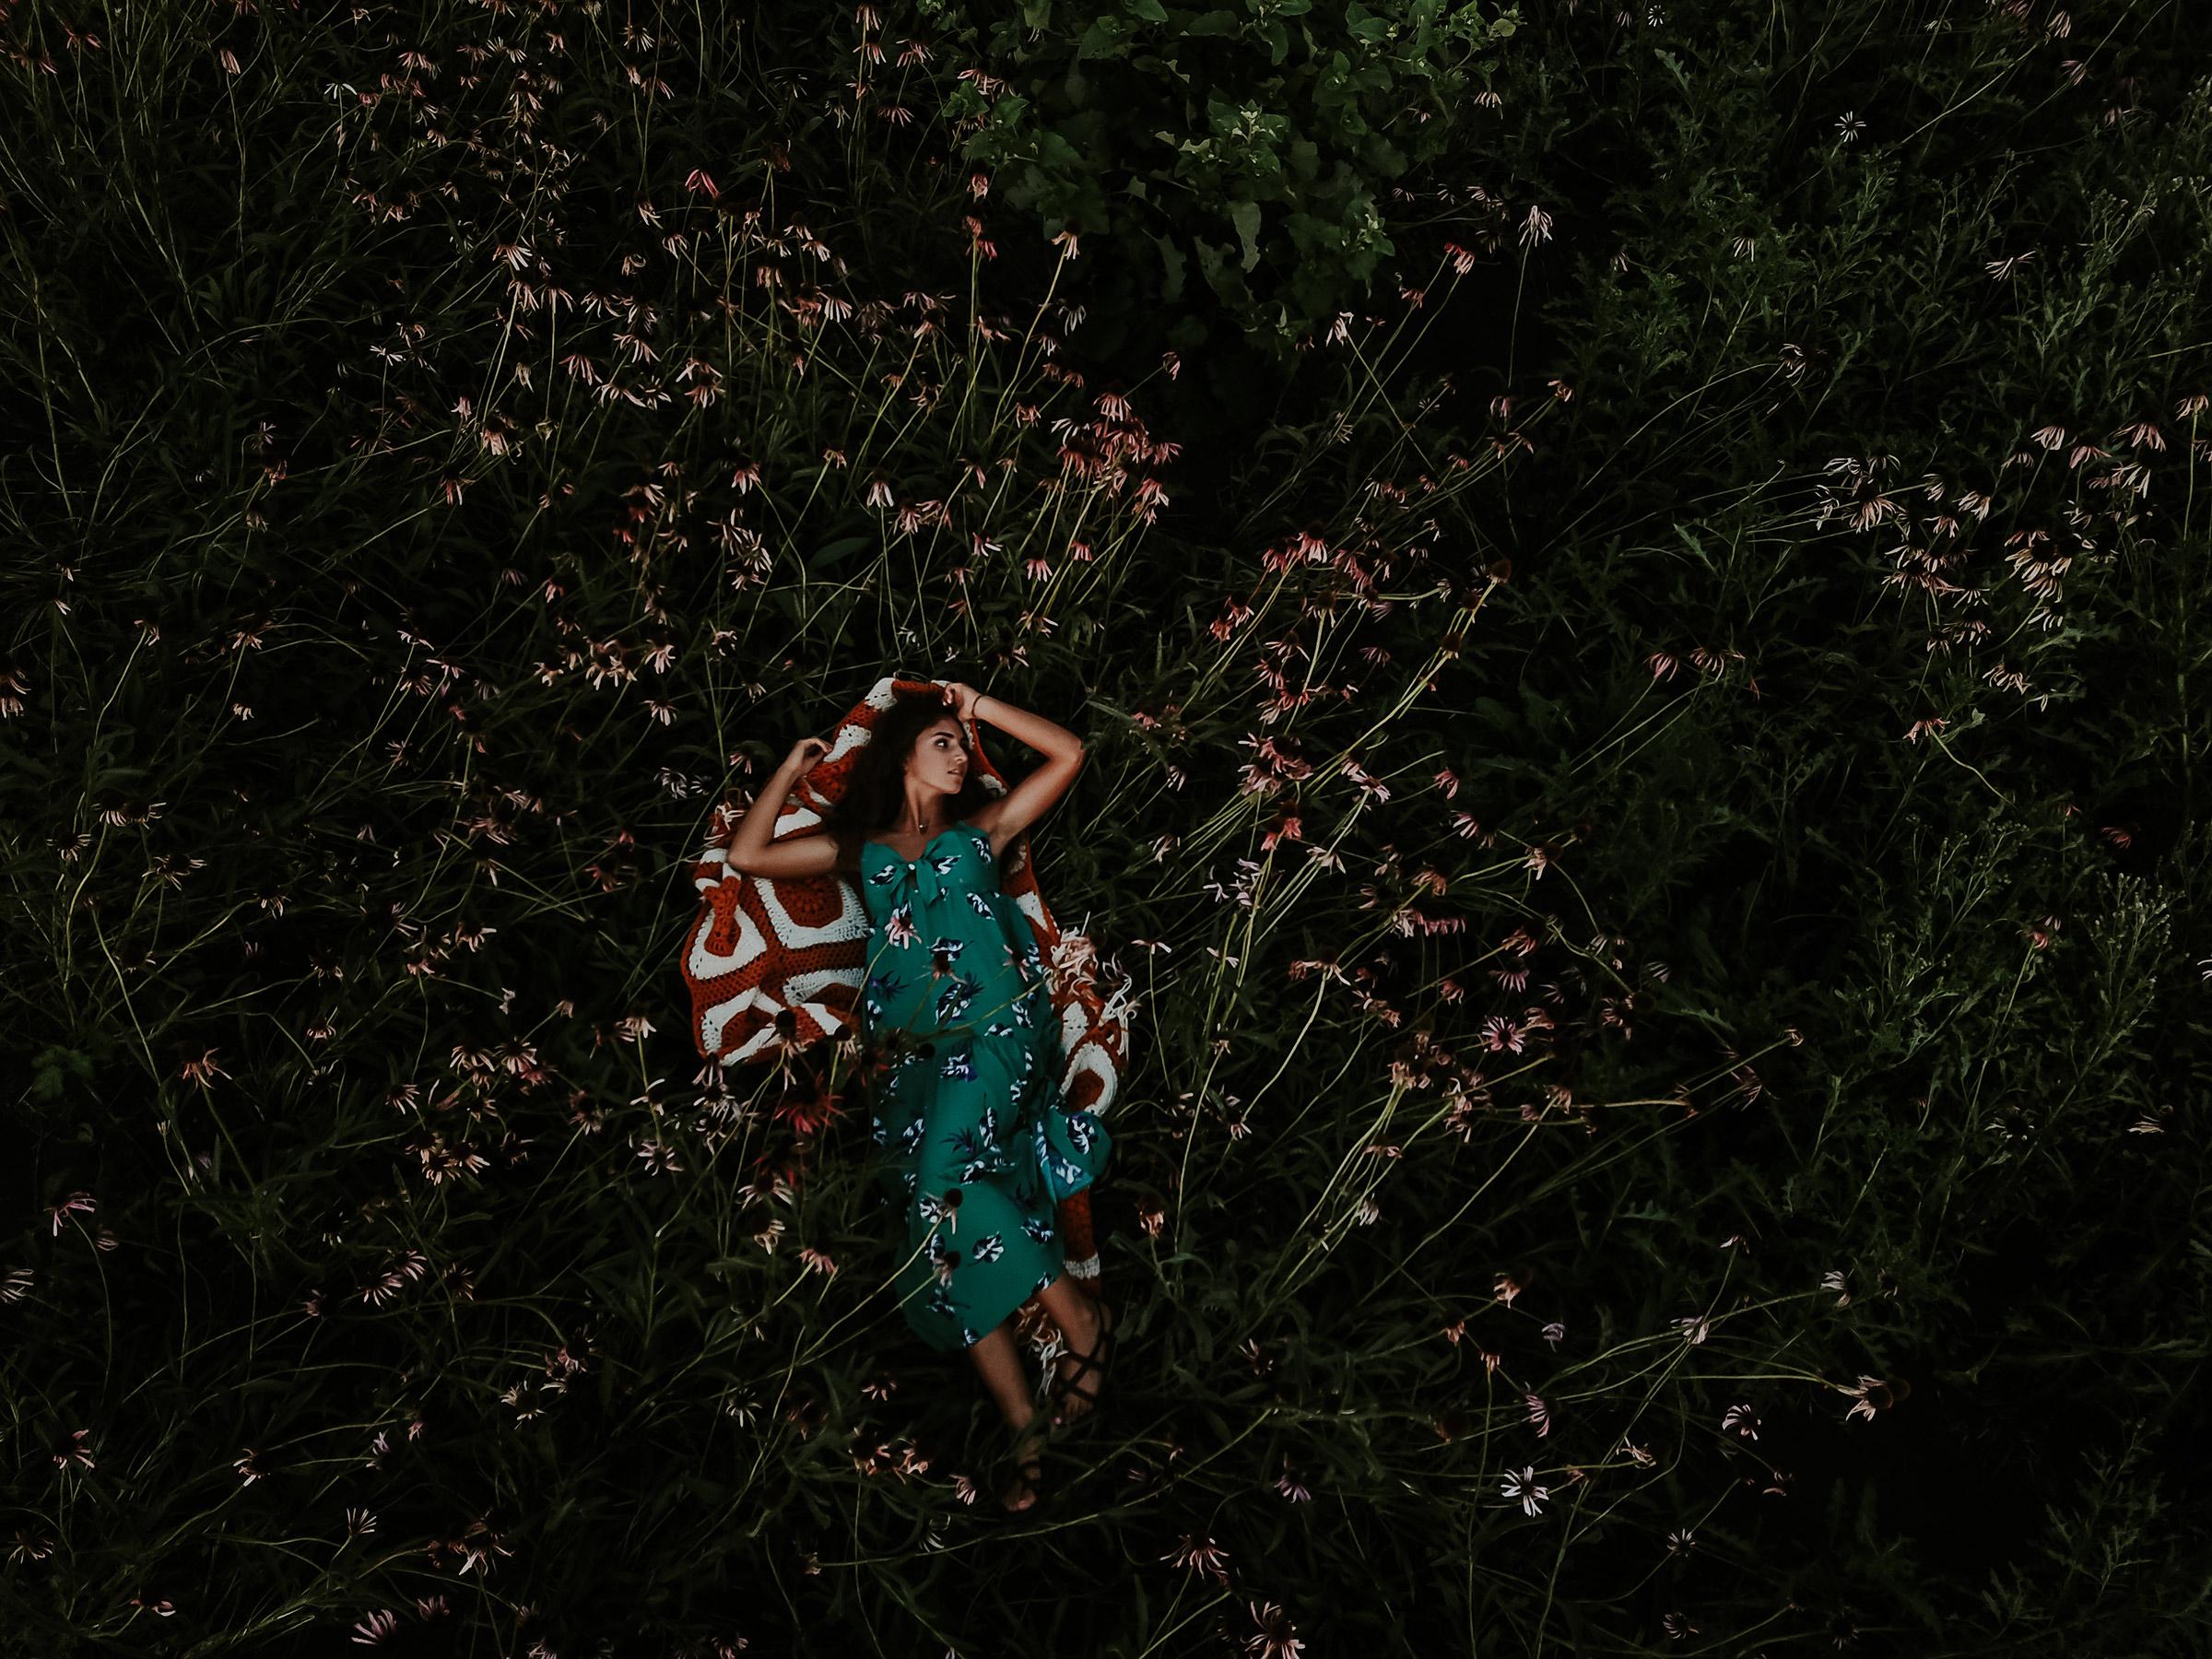 lizzy-senior-girl-laying-in-flower-field-winterset-ankeny-high-school-desmoines-iowa-raelyn-ramey-photography-2.jpg